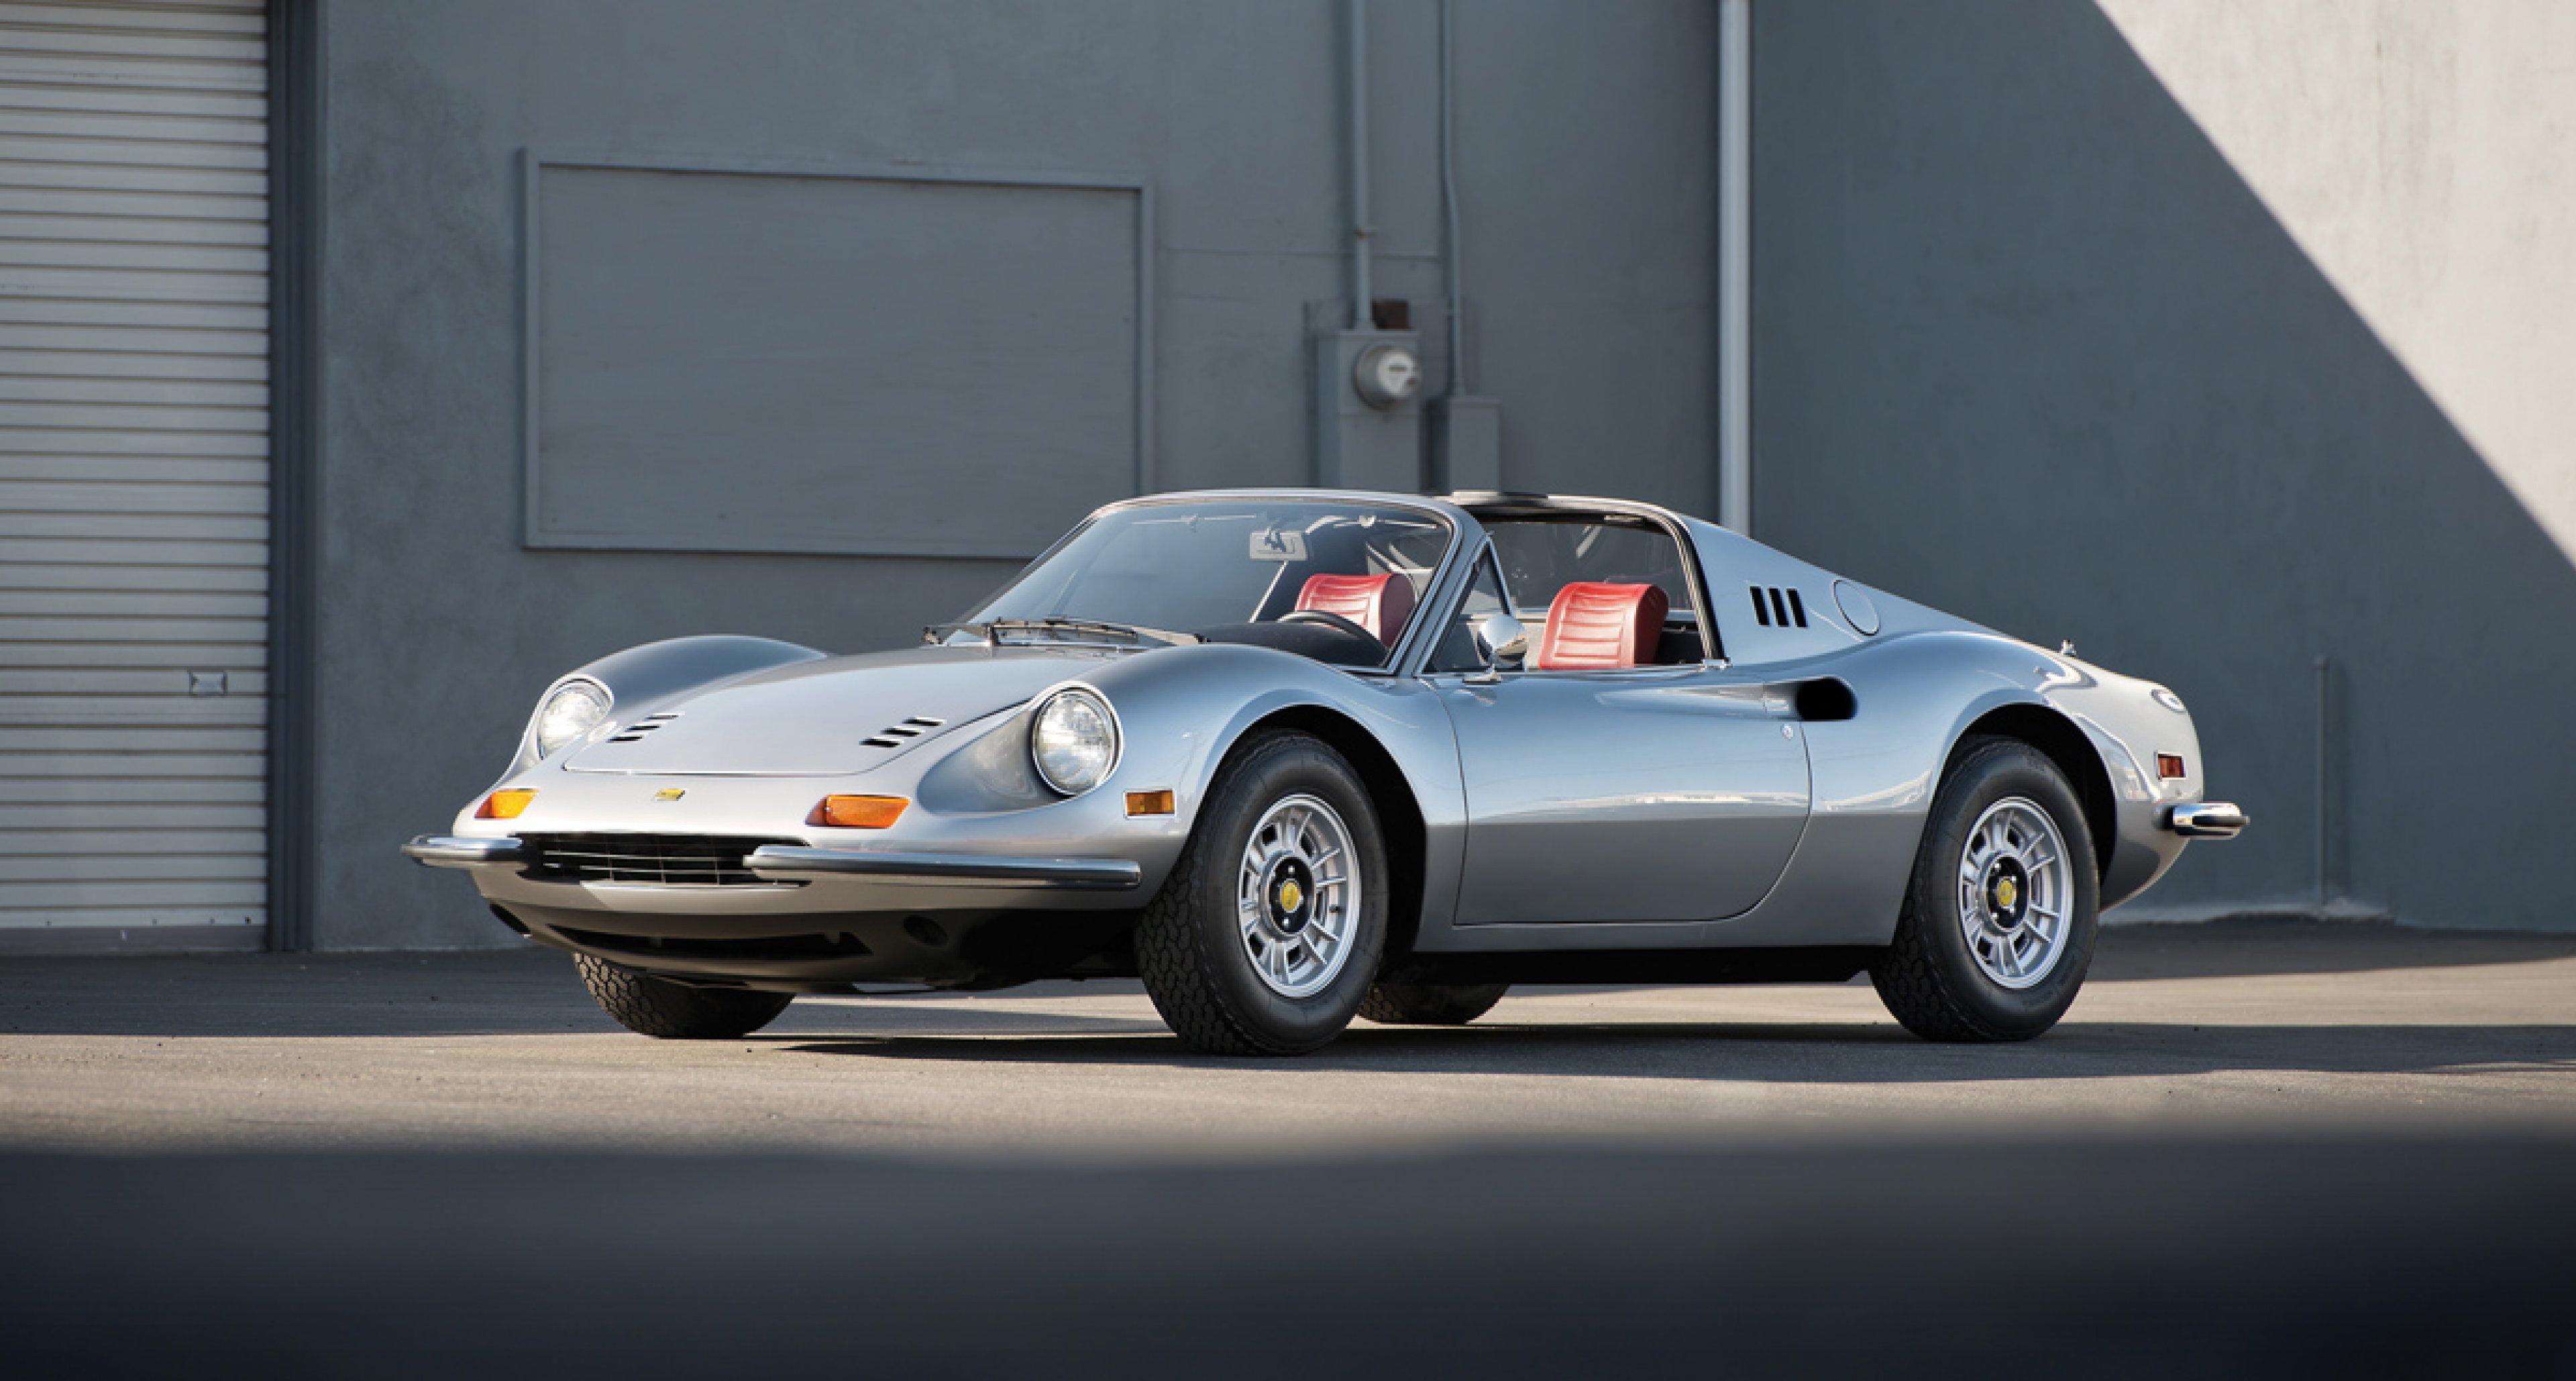 RM Auctions 1974 Ferrari Dino 246 GTS